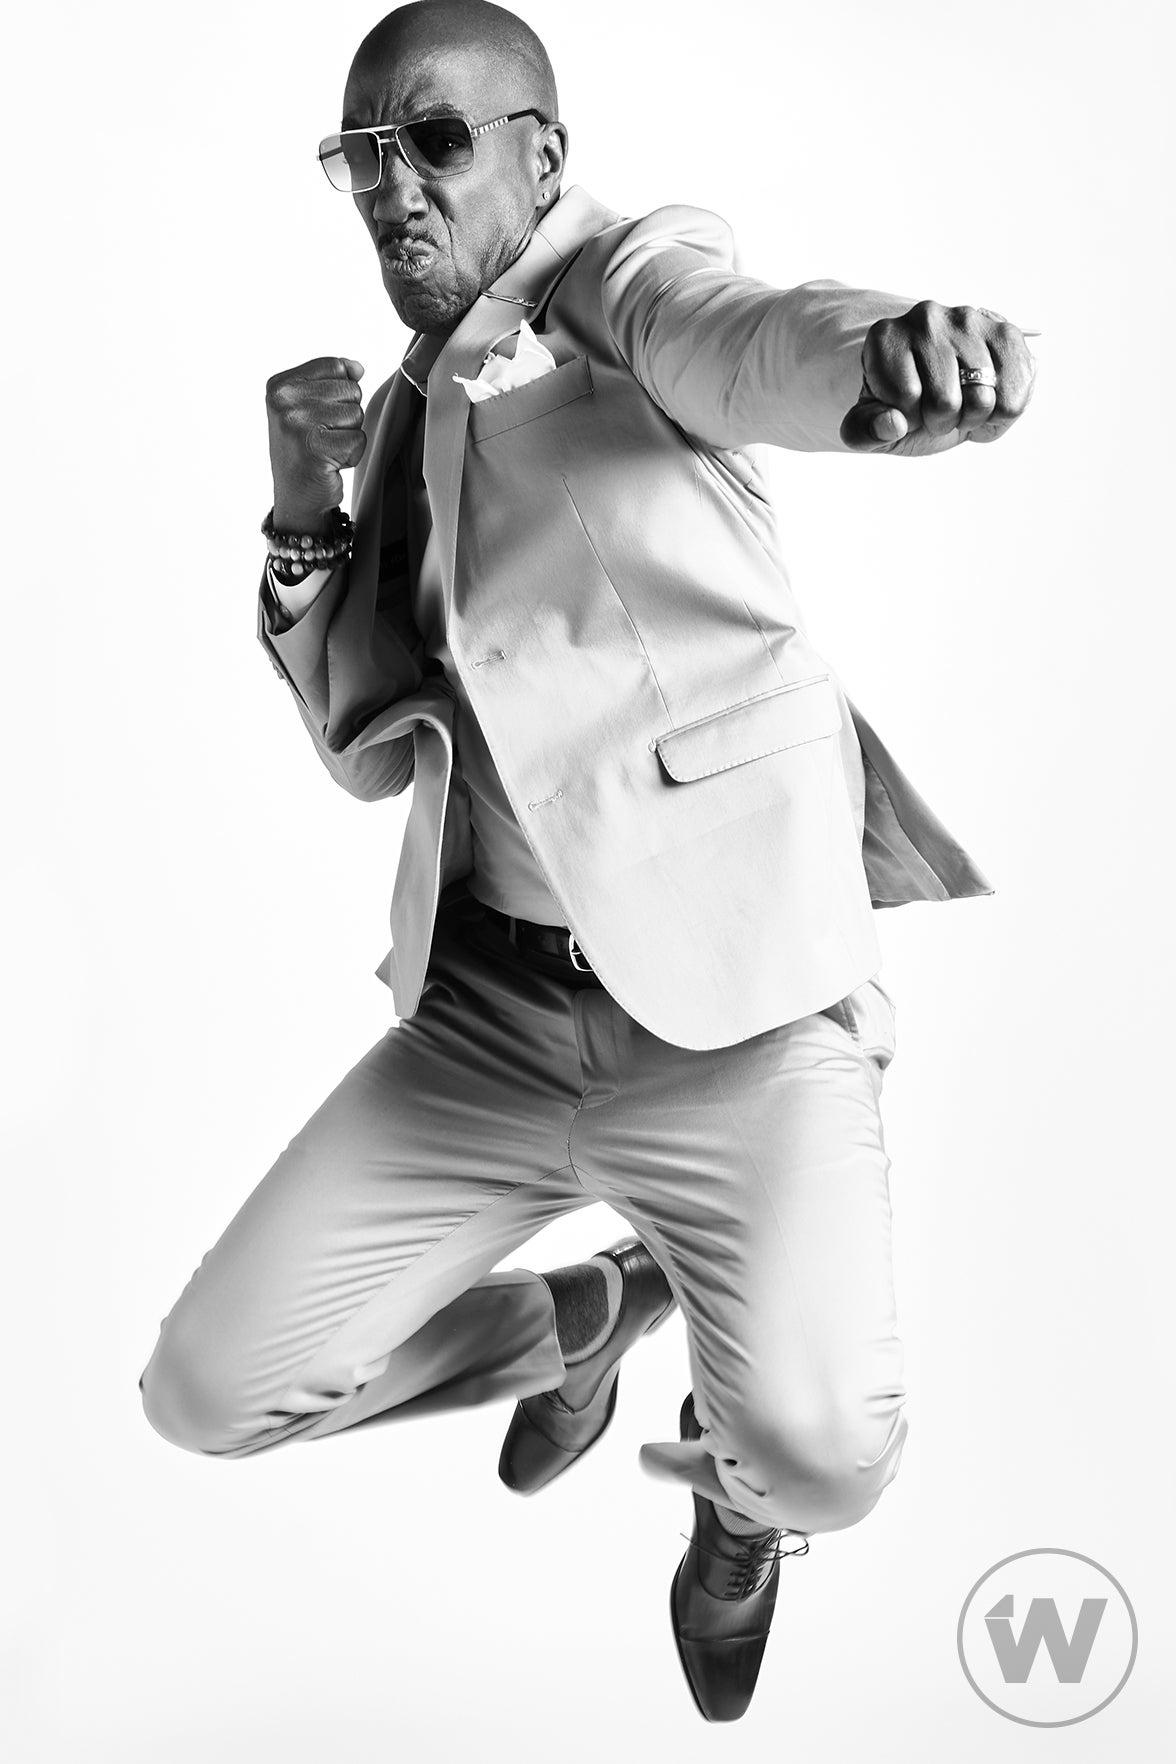 J. B. Smoove, Curb Your Enthusiasm